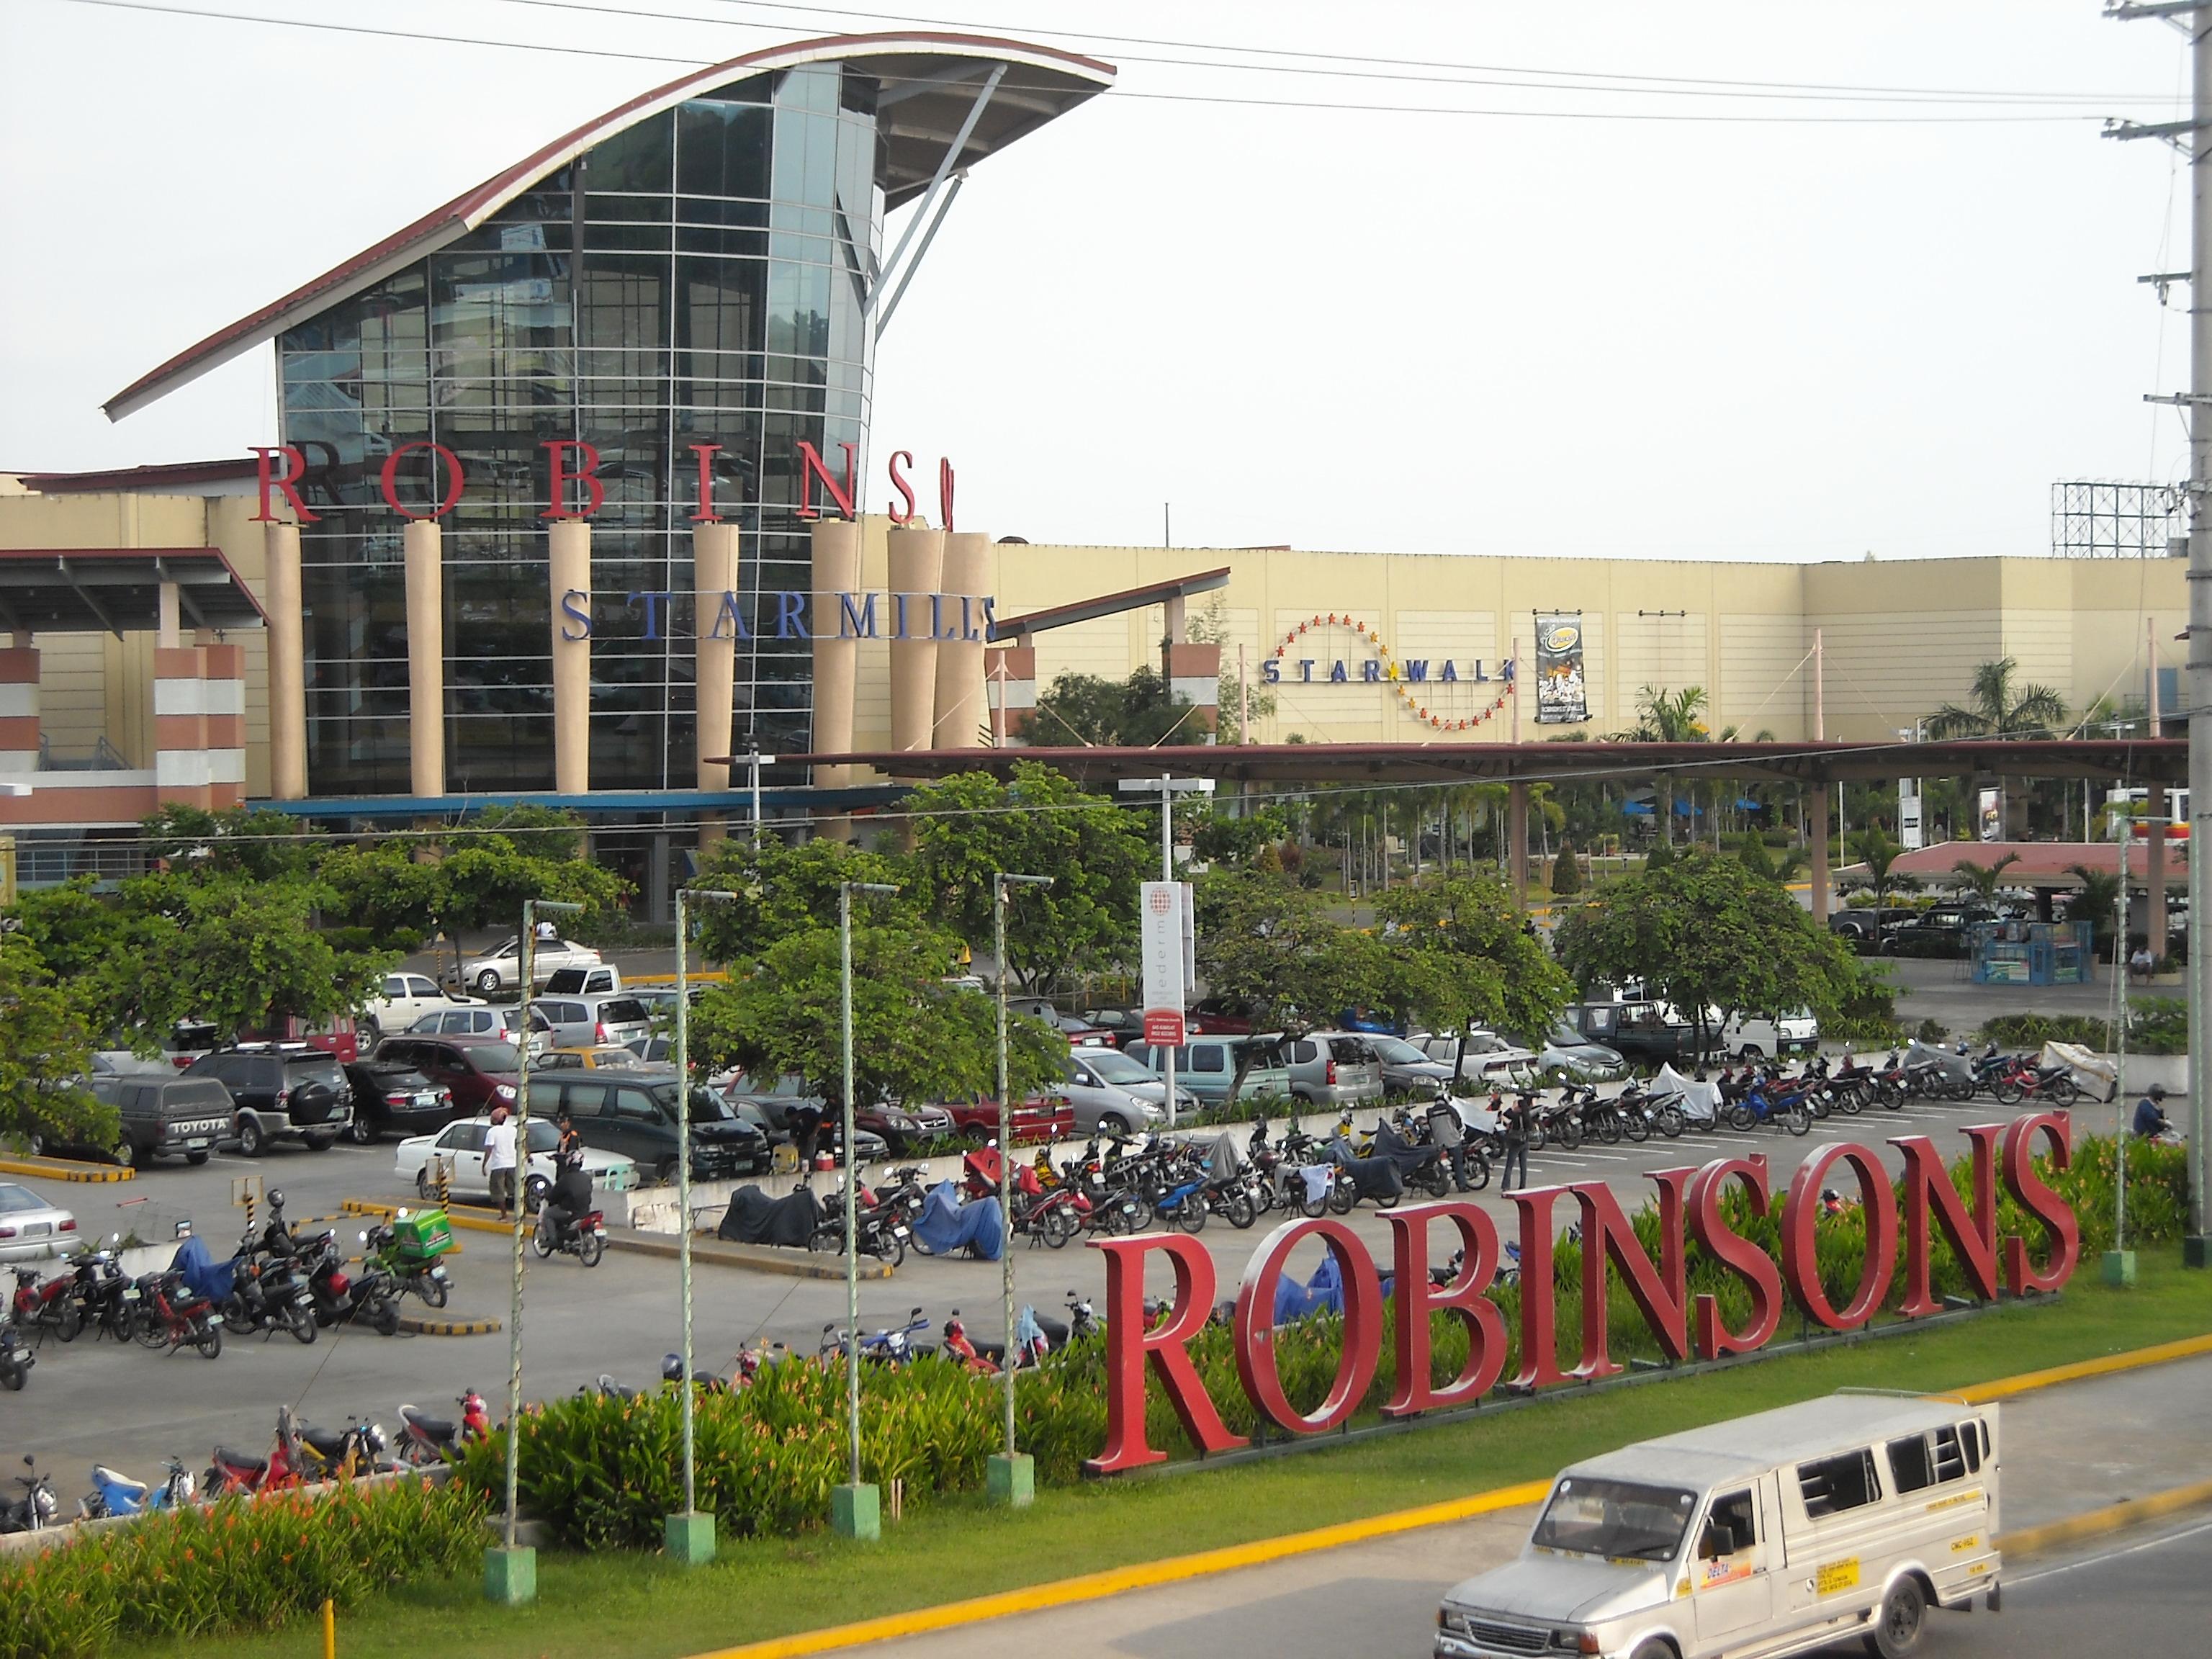 File:Robinsons Starmills